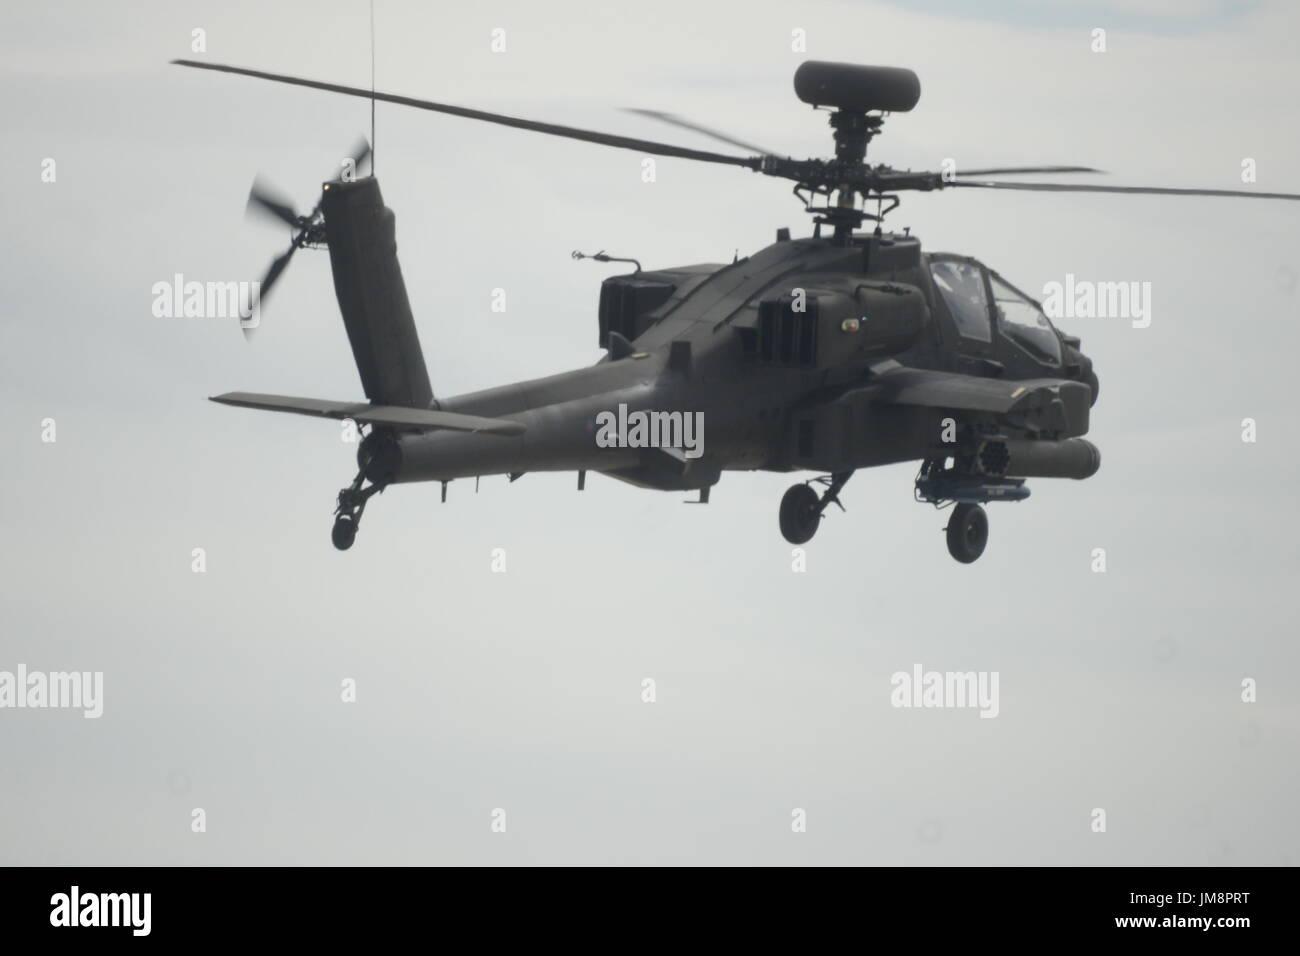 Ah 64 Apache Helicopter Stock Photos & Ah 64 Apache ...